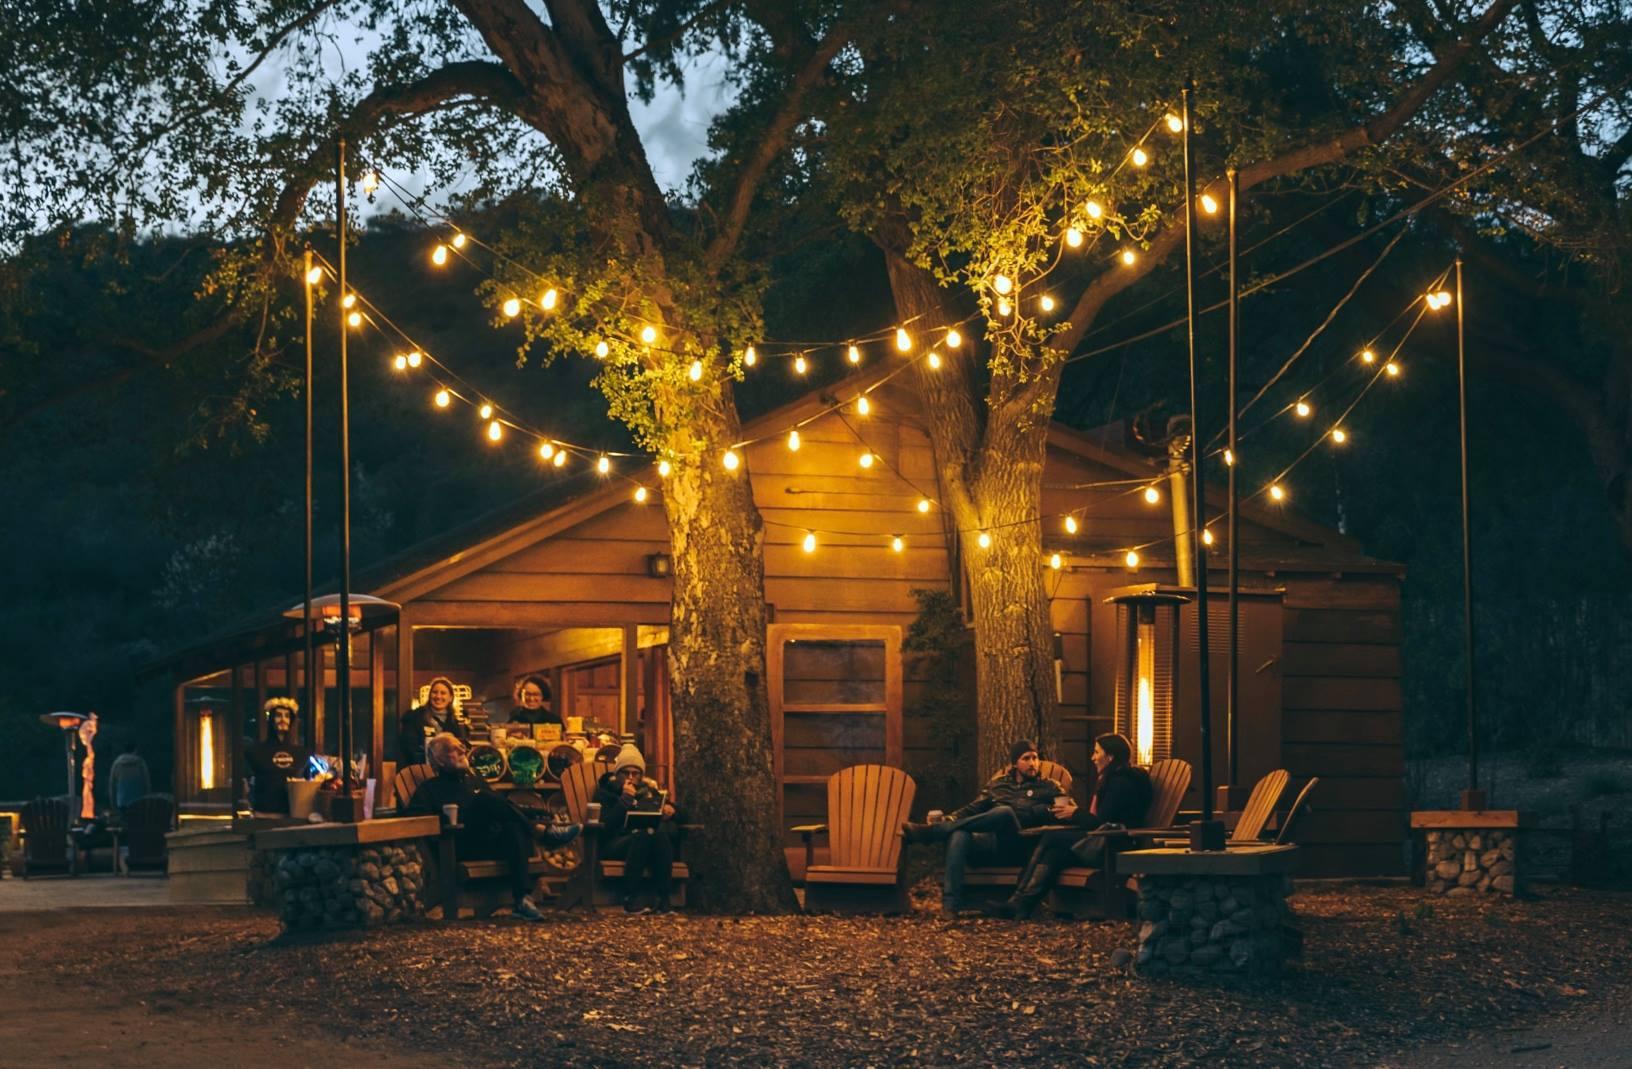 Night Garden at Descanso Gardens